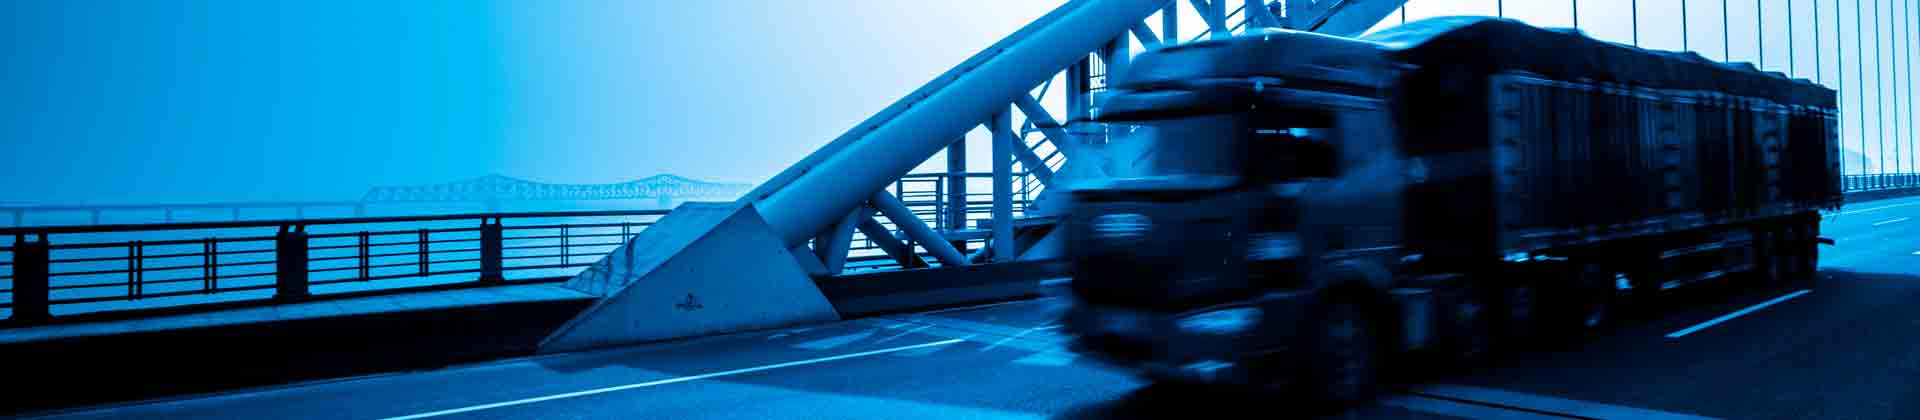 IVG Industrie-Verpackungs- und Transportgesellschaft mbH